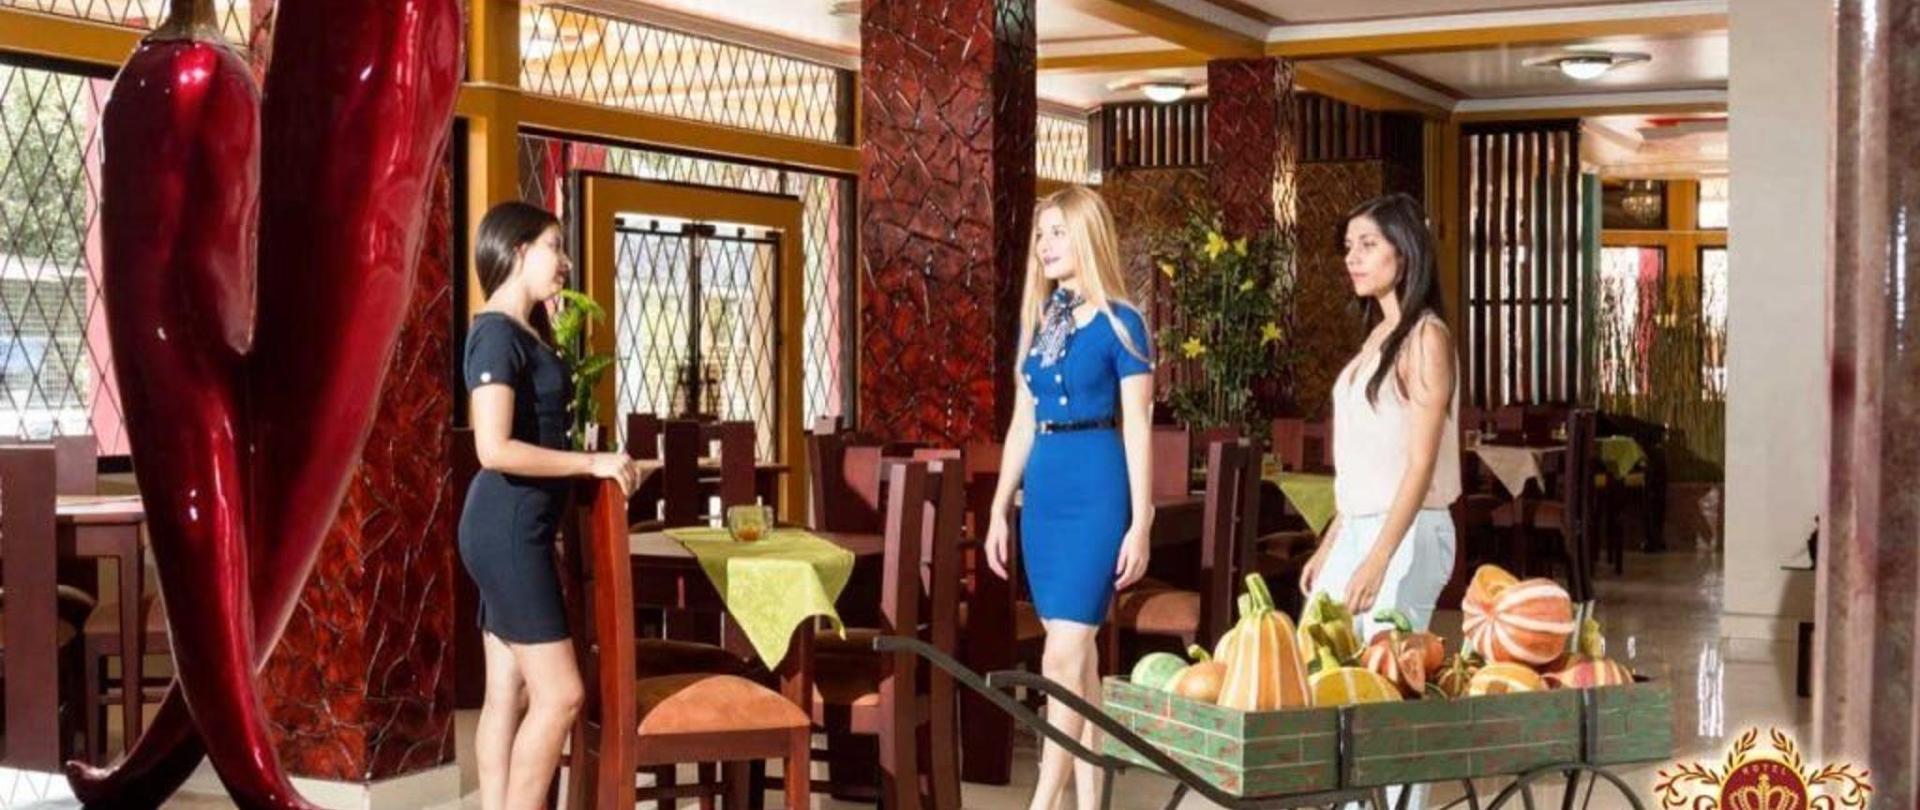 restaurante1b-4.jpg